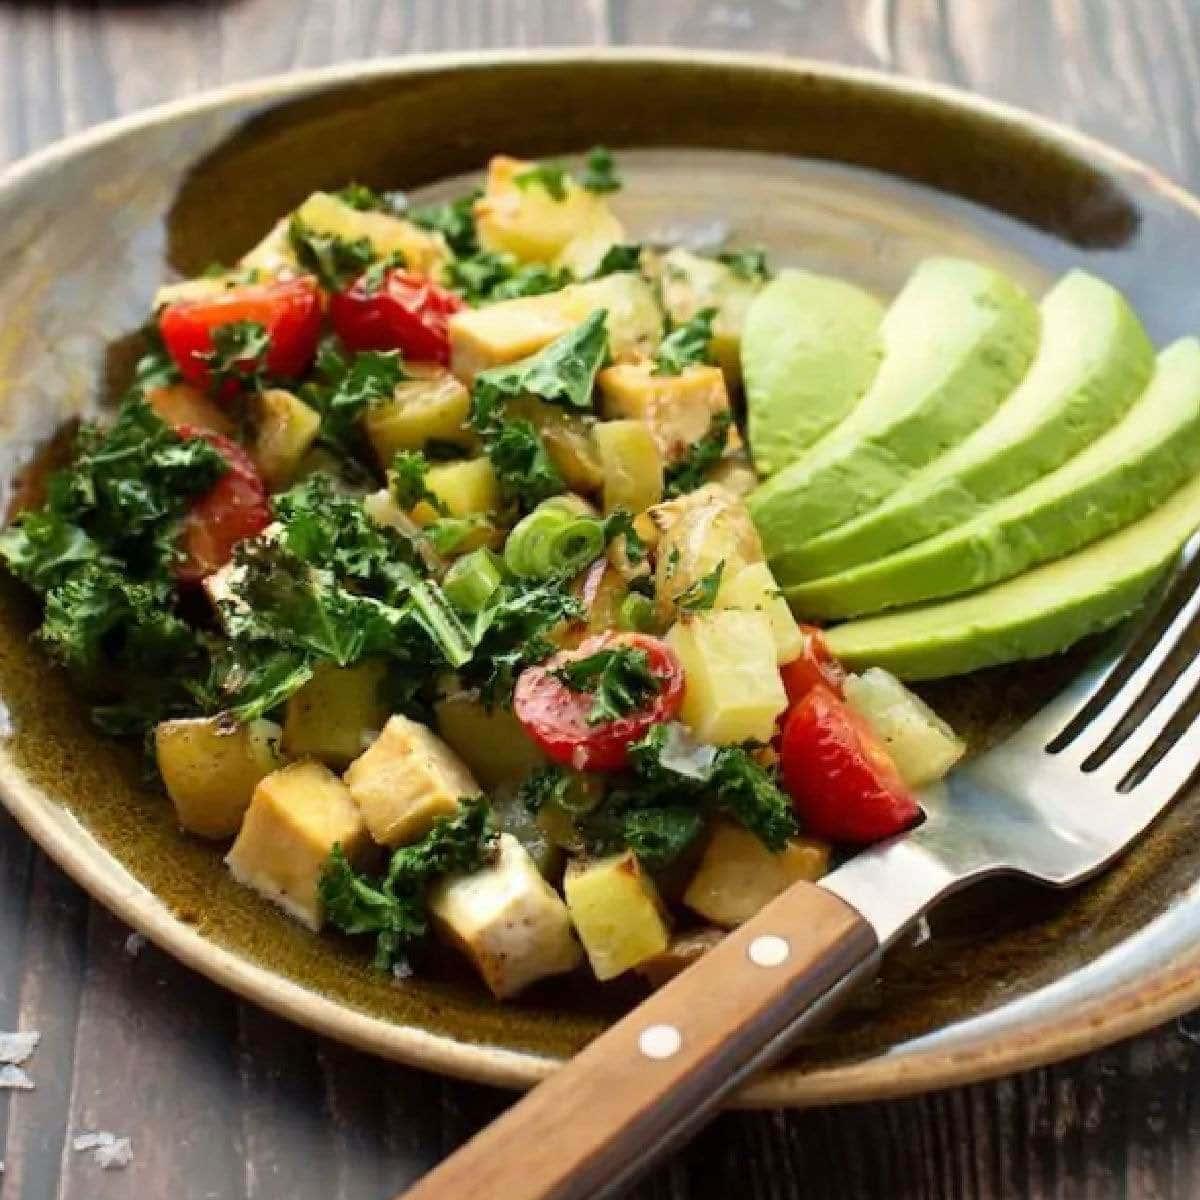 Plate of vegan sheet pan hash browns with tofu and veggies.